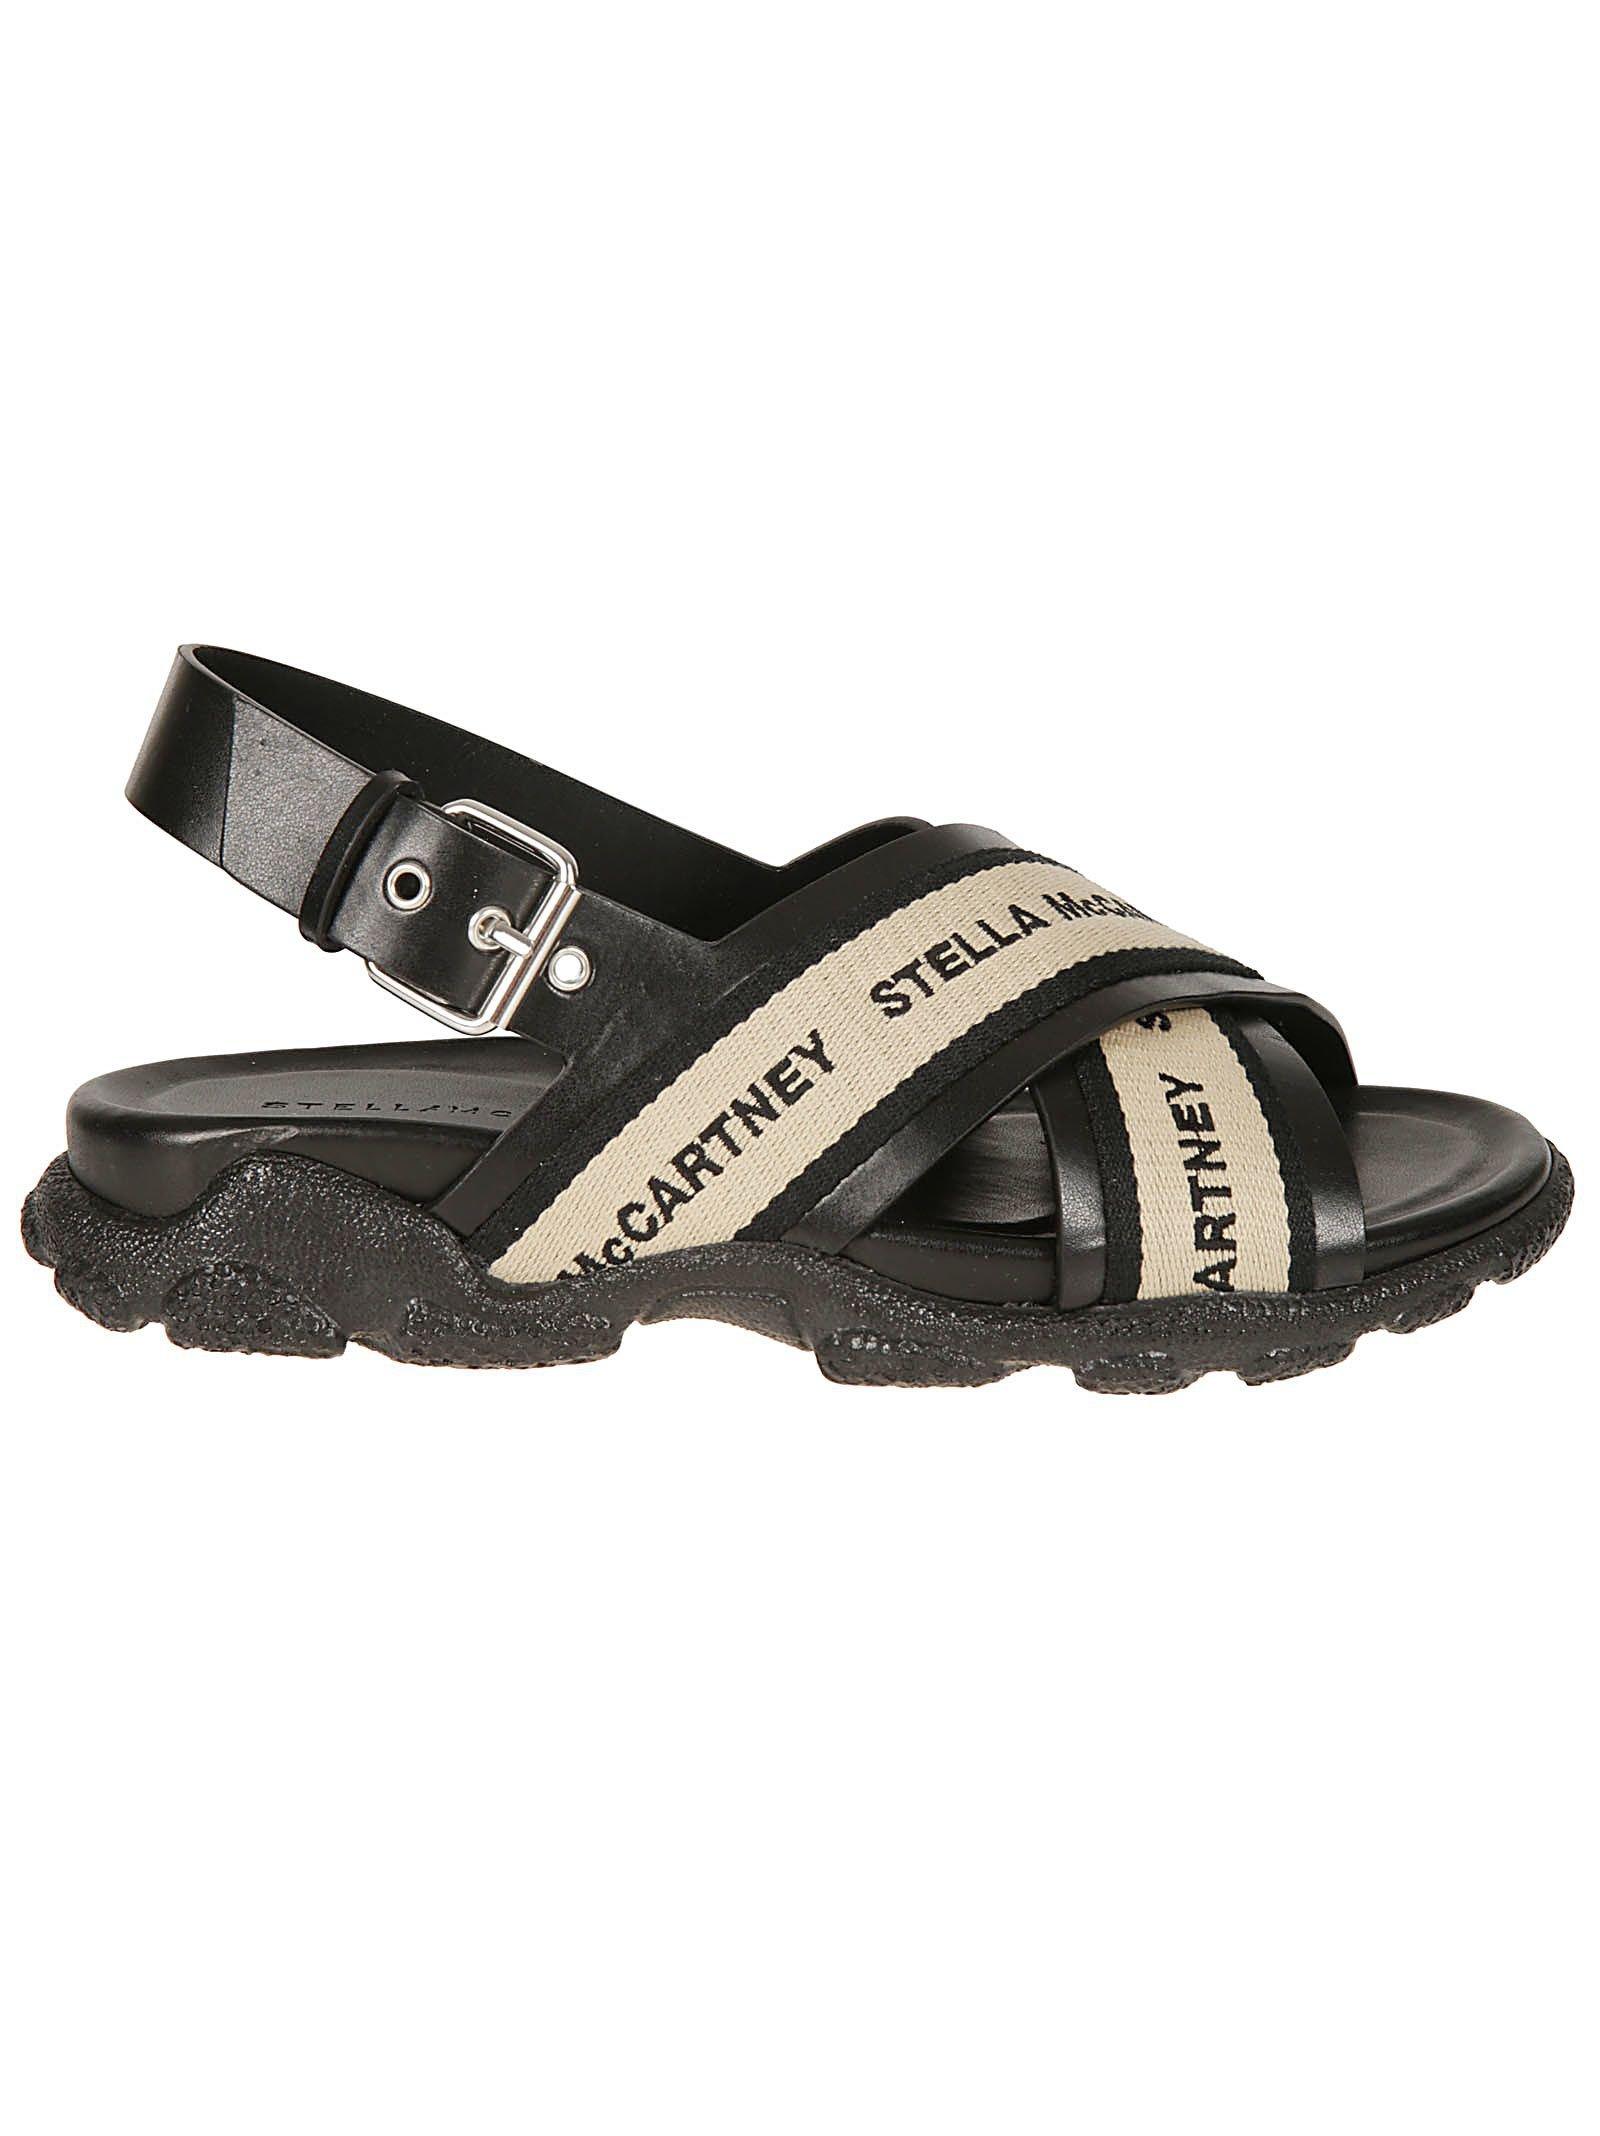 Stella Mccartney Cross Straps Sandals